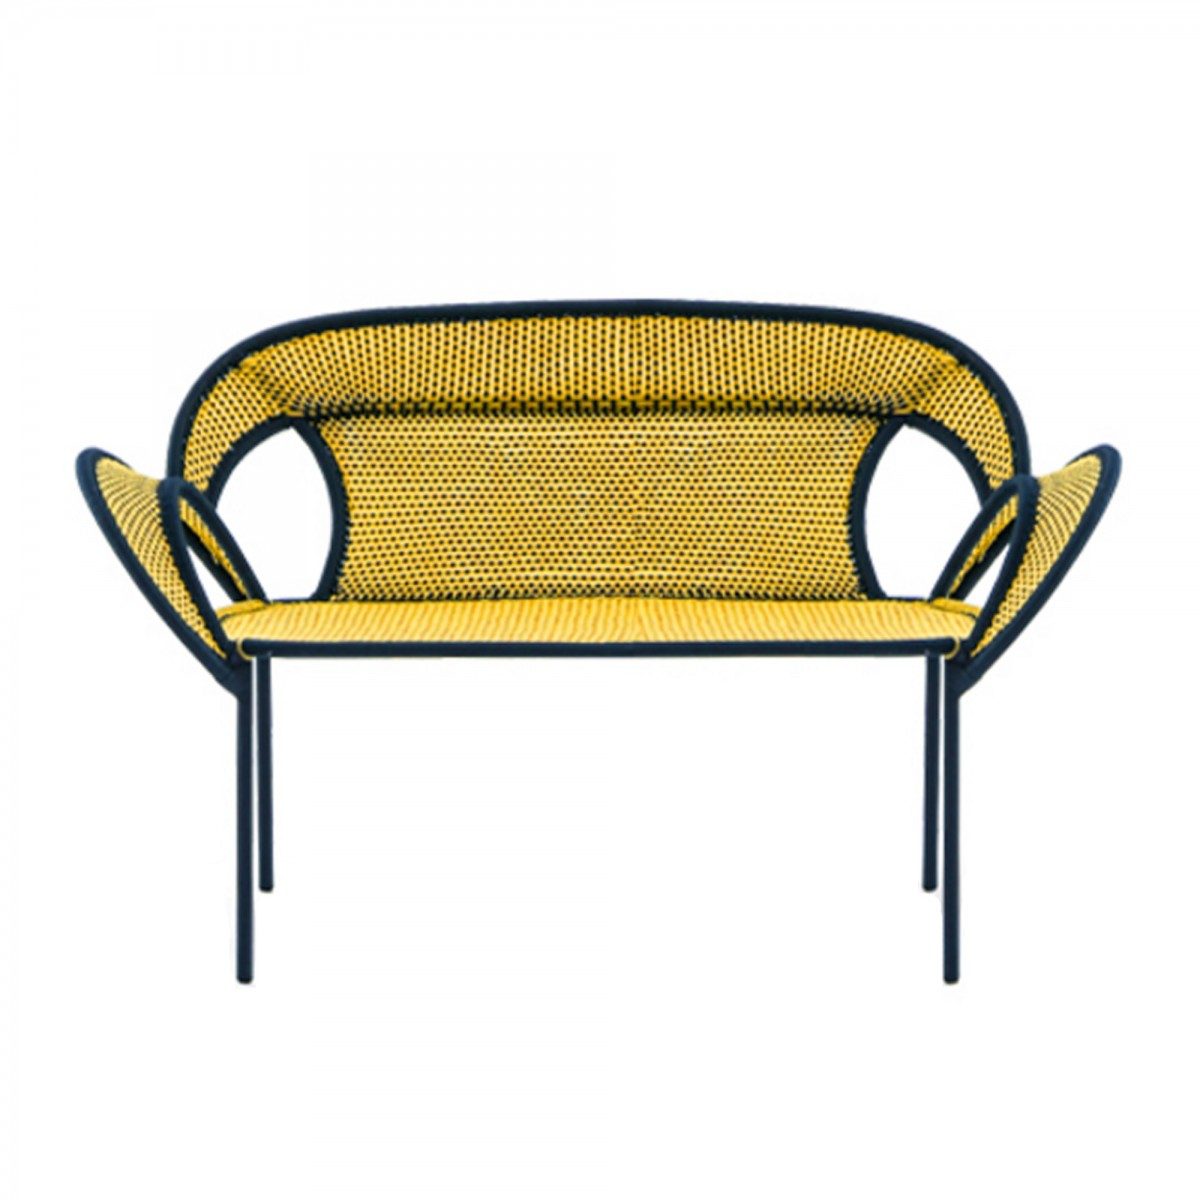 canap banjooli jaune noir moroso. Black Bedroom Furniture Sets. Home Design Ideas